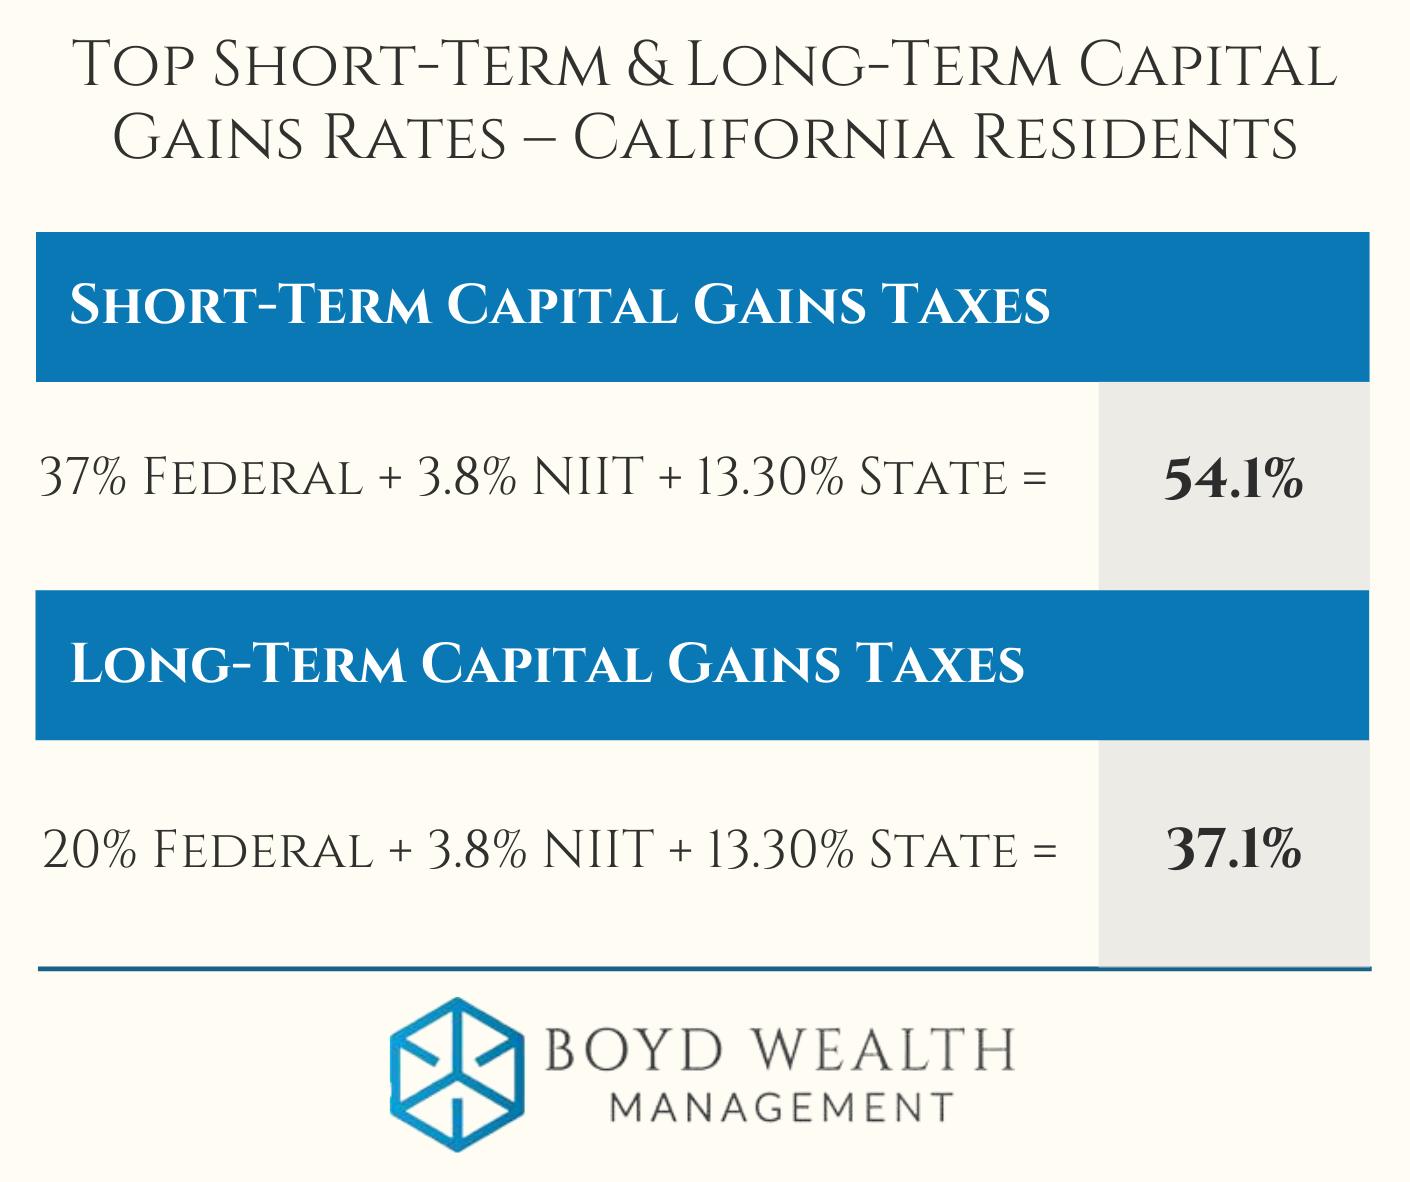 Capital gains taxes